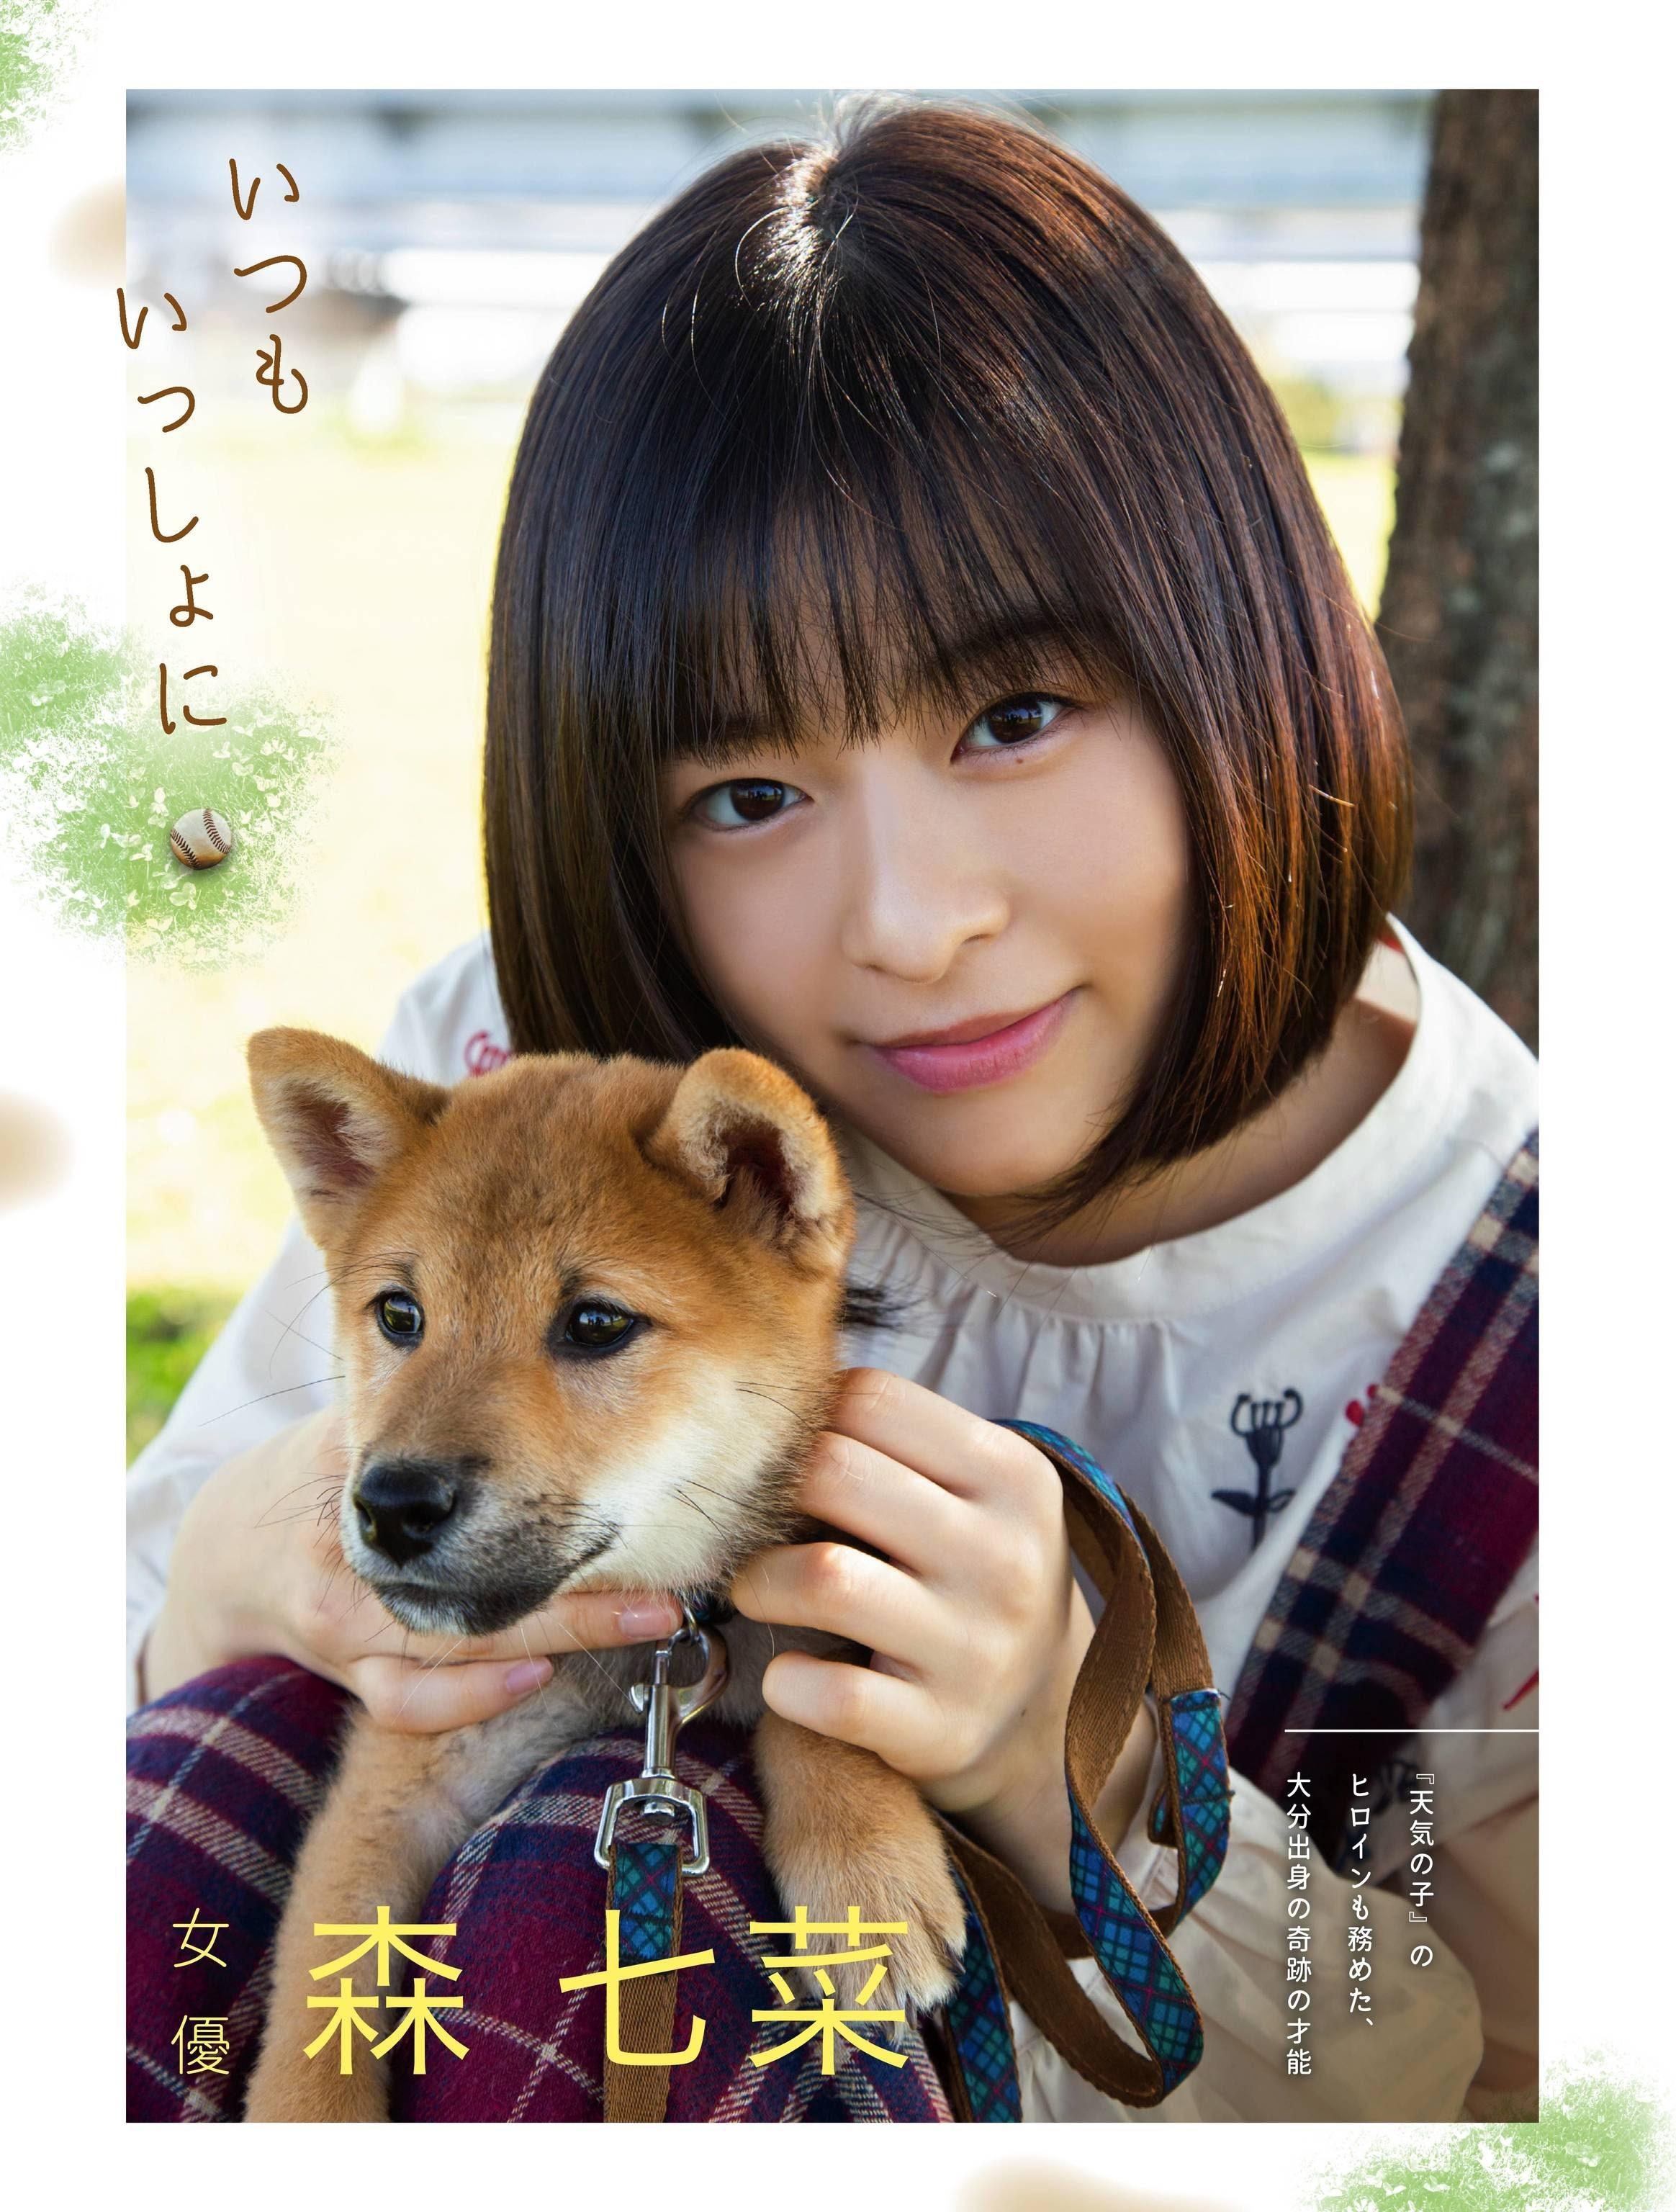 13-Nana Mori (1)